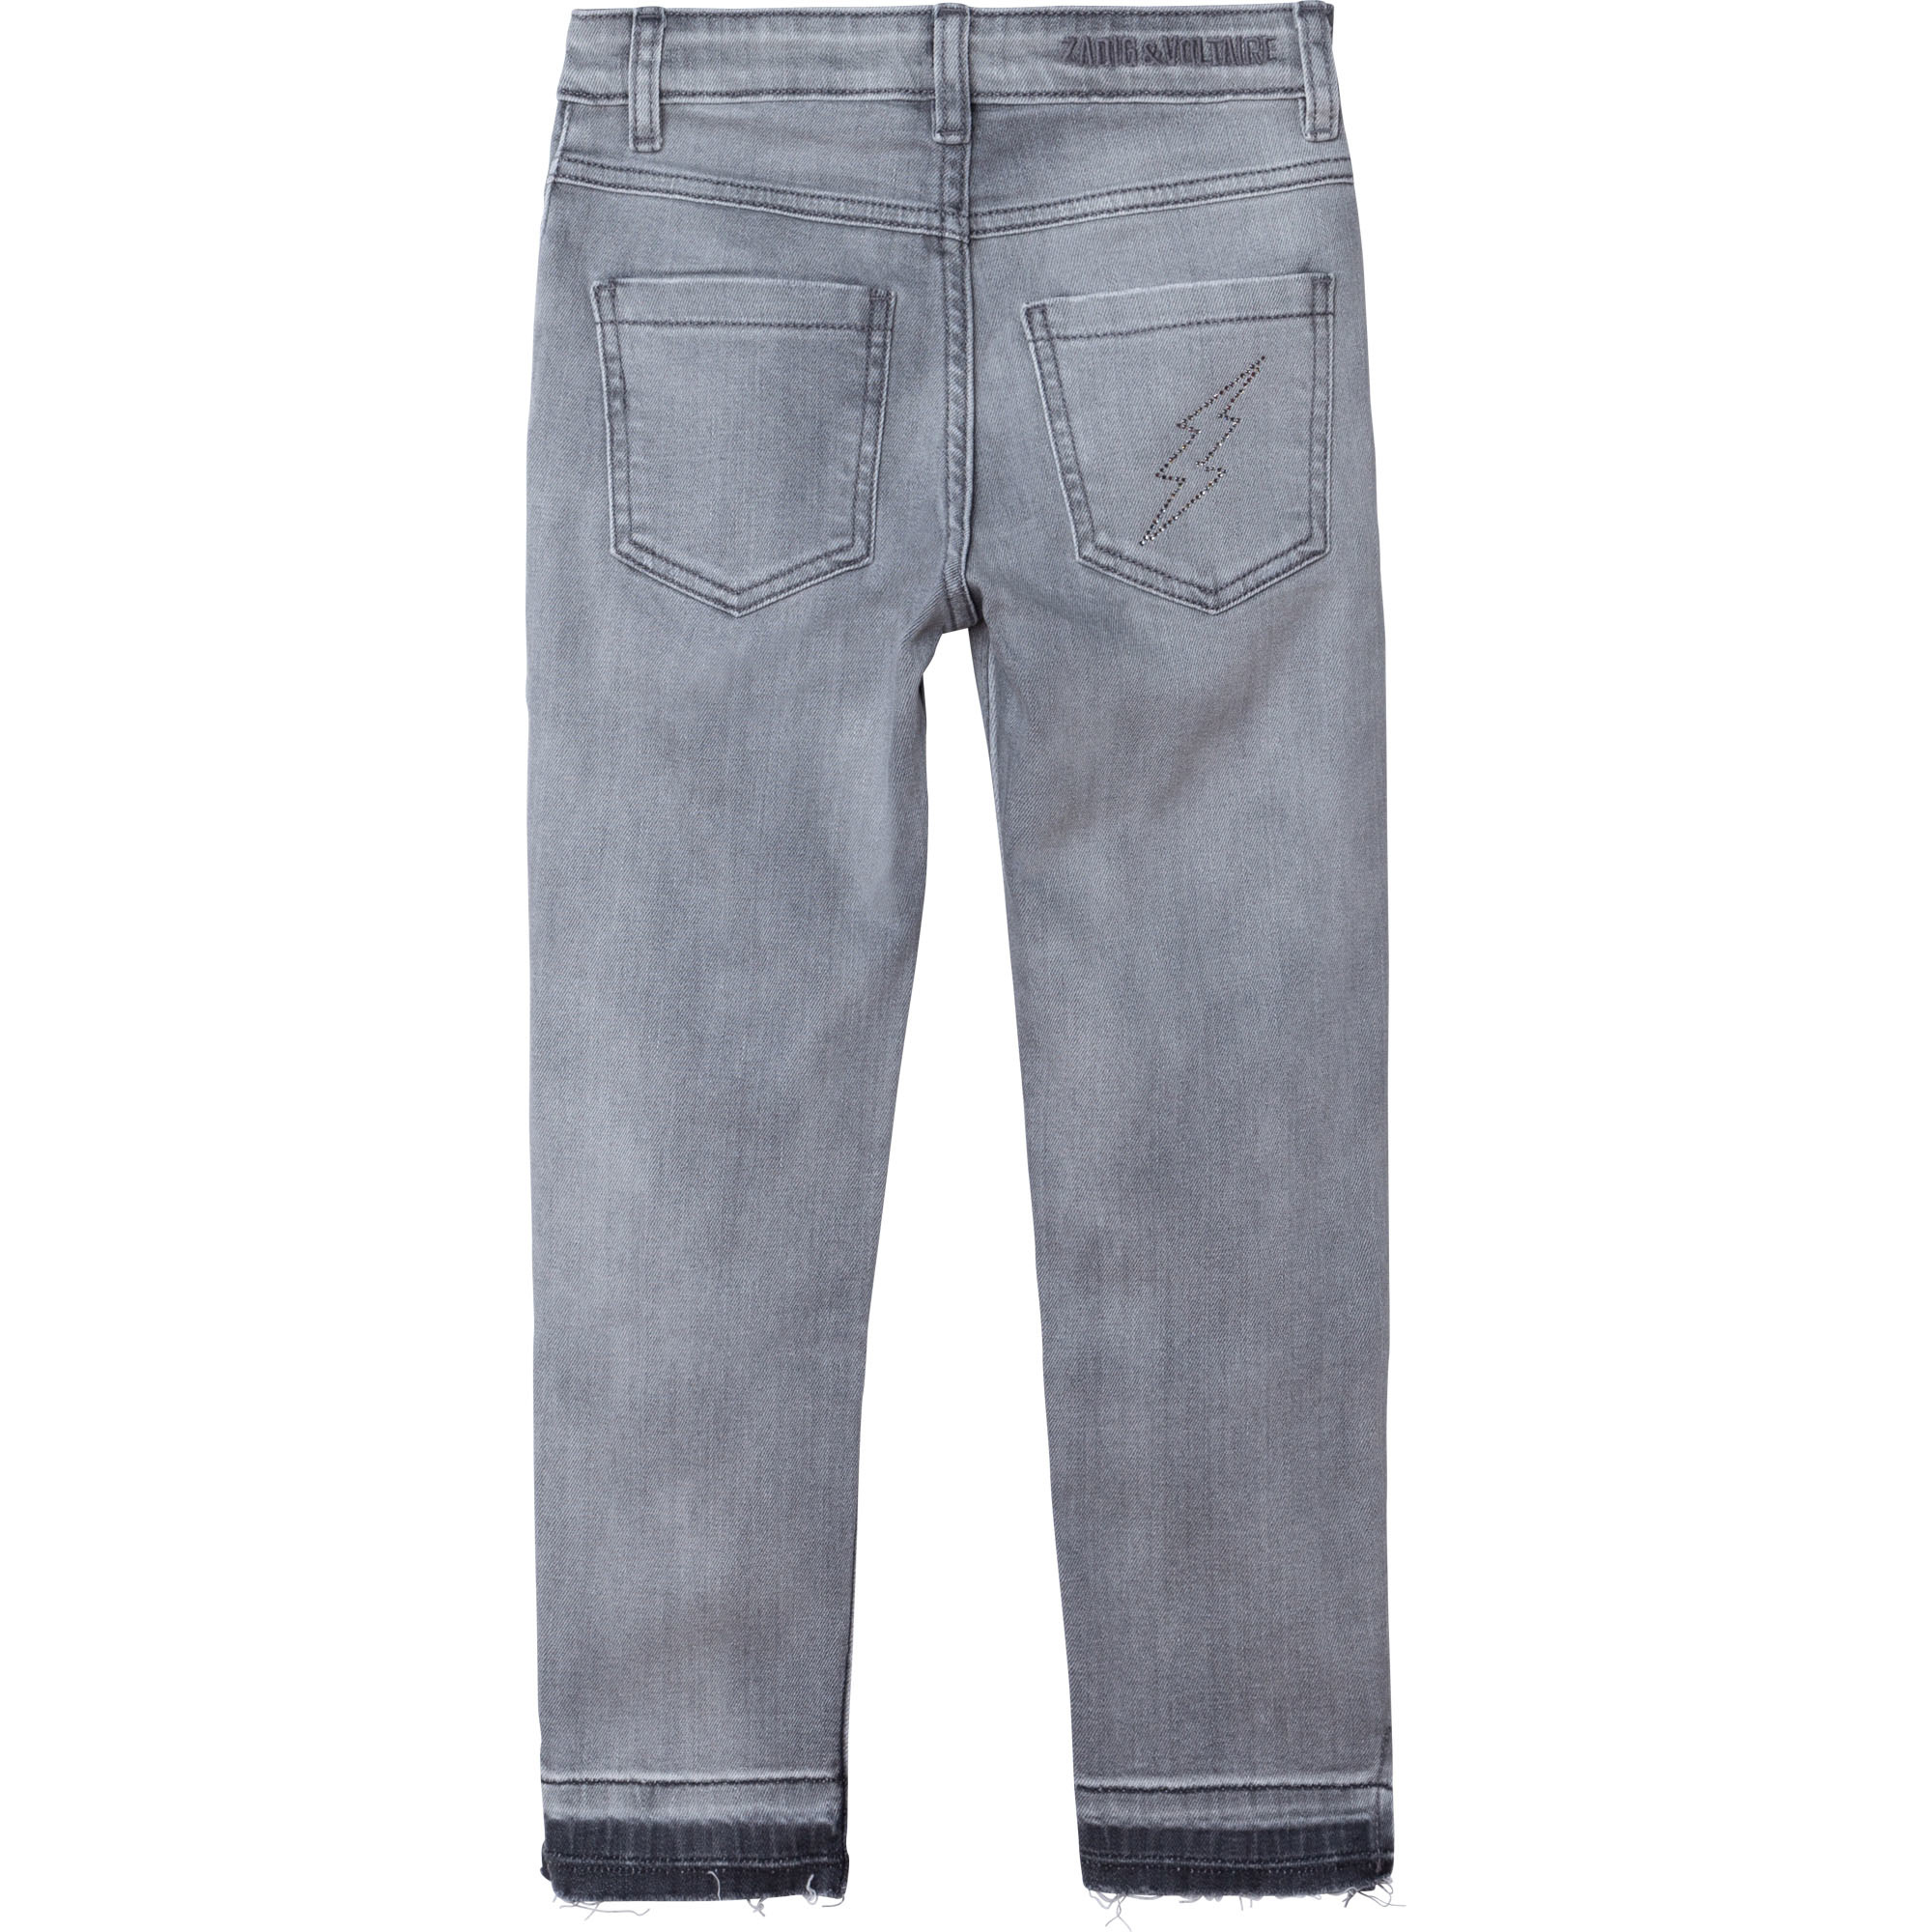 ZADIG&VOLTAIRE jean slim avec strass-2